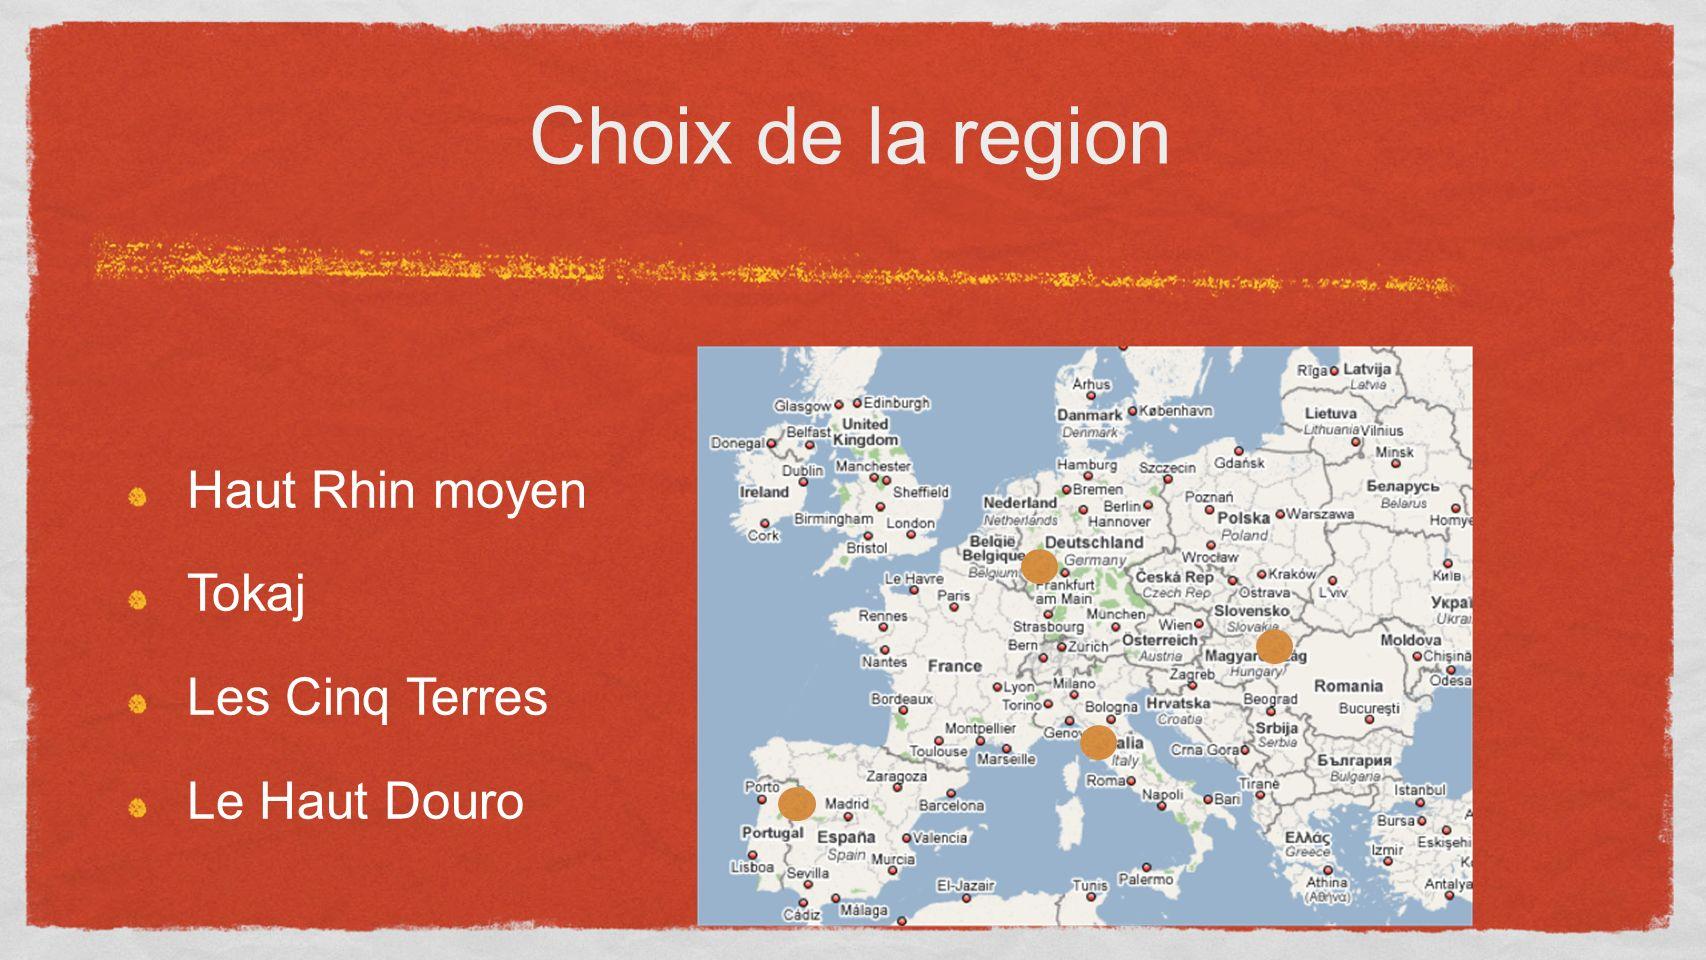 Choix de la region Haut Rhin moyen Tokaj Les Cinq Terres Le Haut Douro